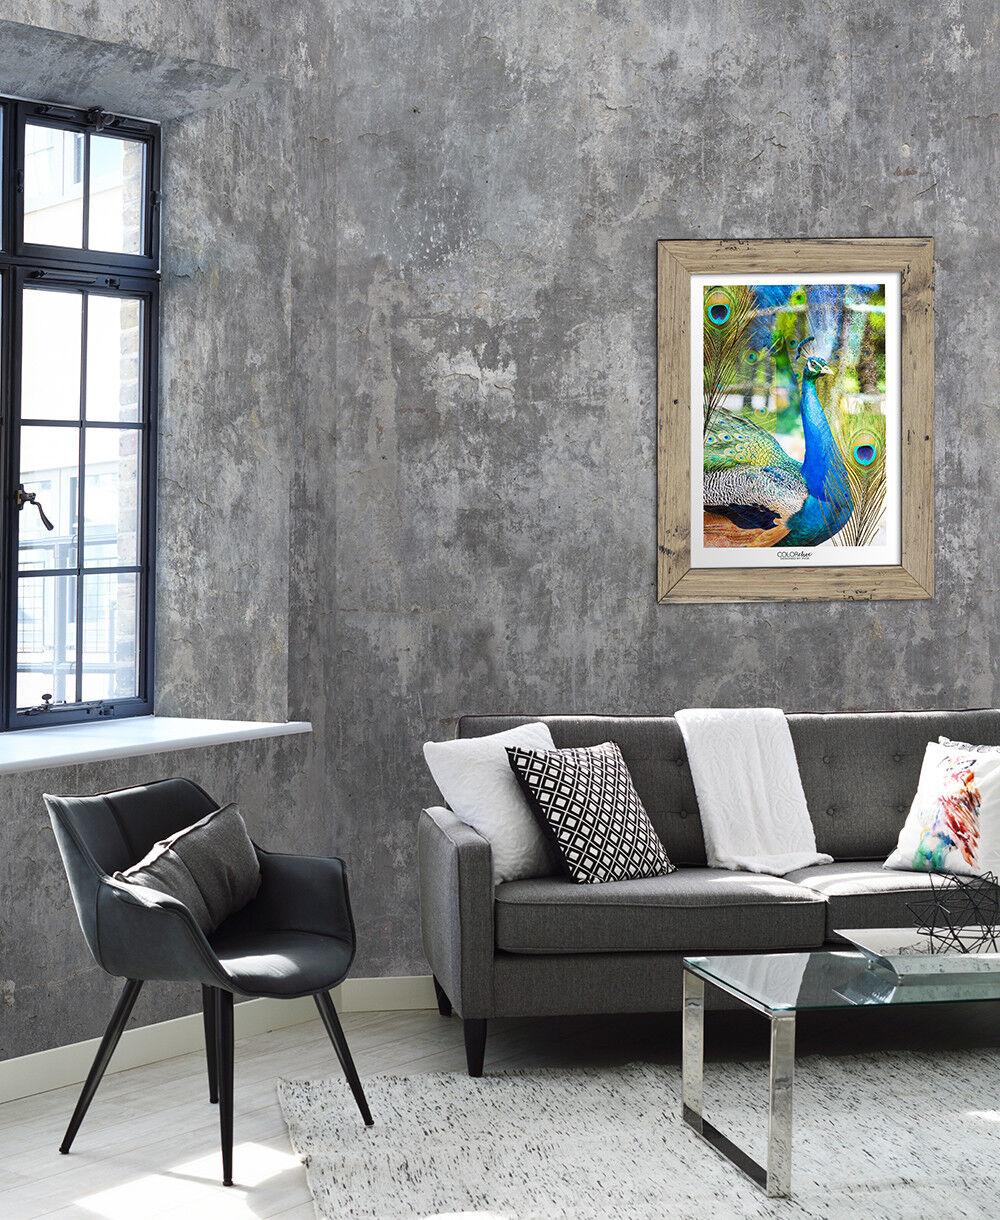 Vlies Foto Tapete Steinwand Beton Mauer Loft Grau Verwittert Wandbild  200x300cm